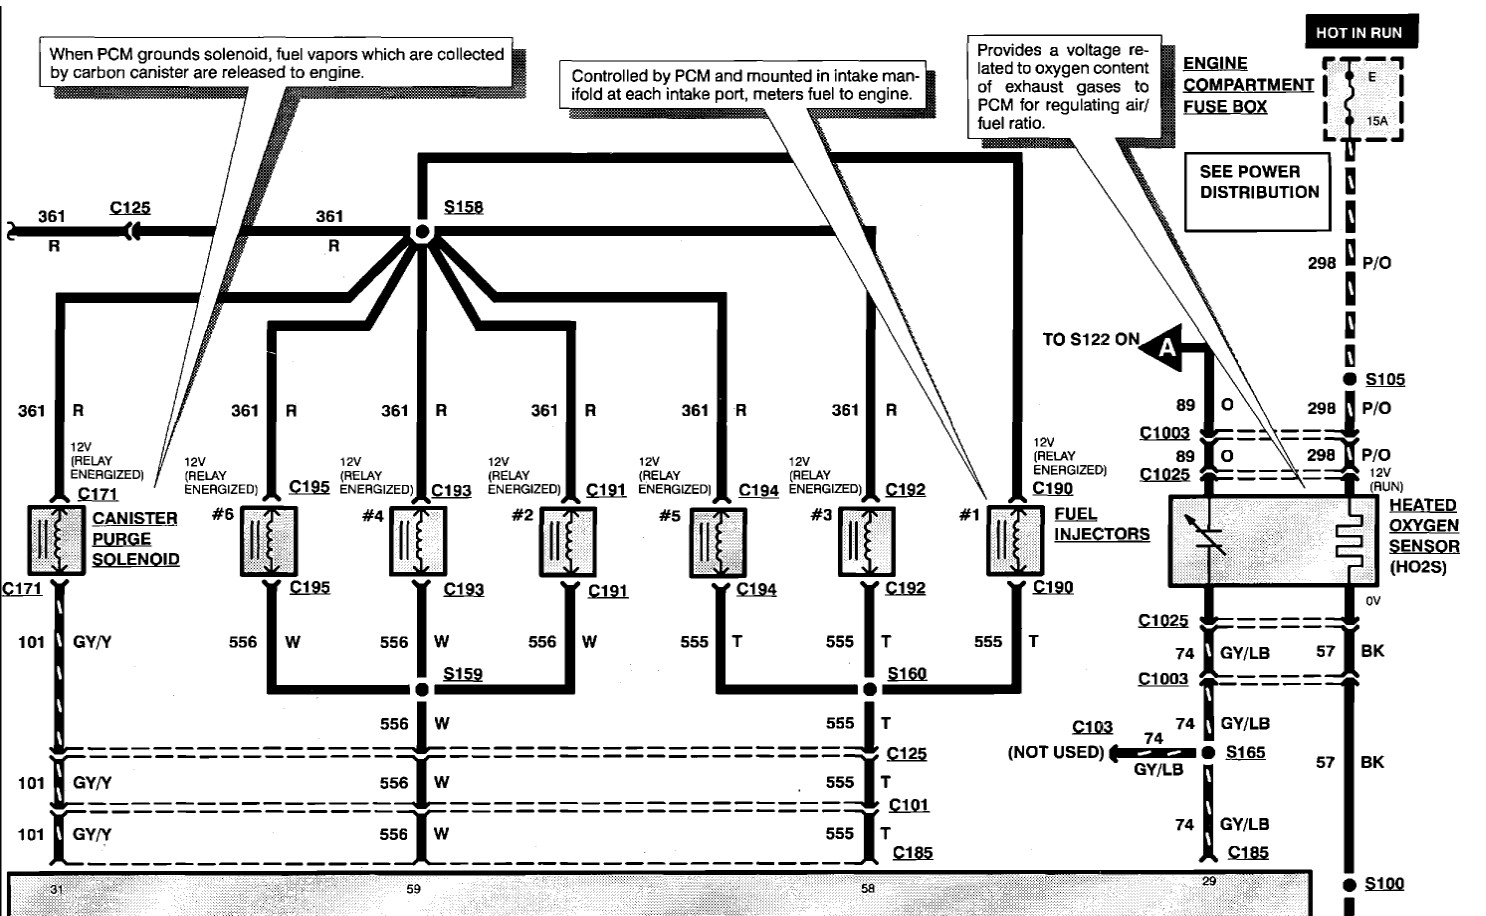 2013 03 04_140202_a1 wiring diagram 94 puma 94 engine diagram, 94 fuse diagram, 94 94 f150 wiring diagram at bayanpartner.co